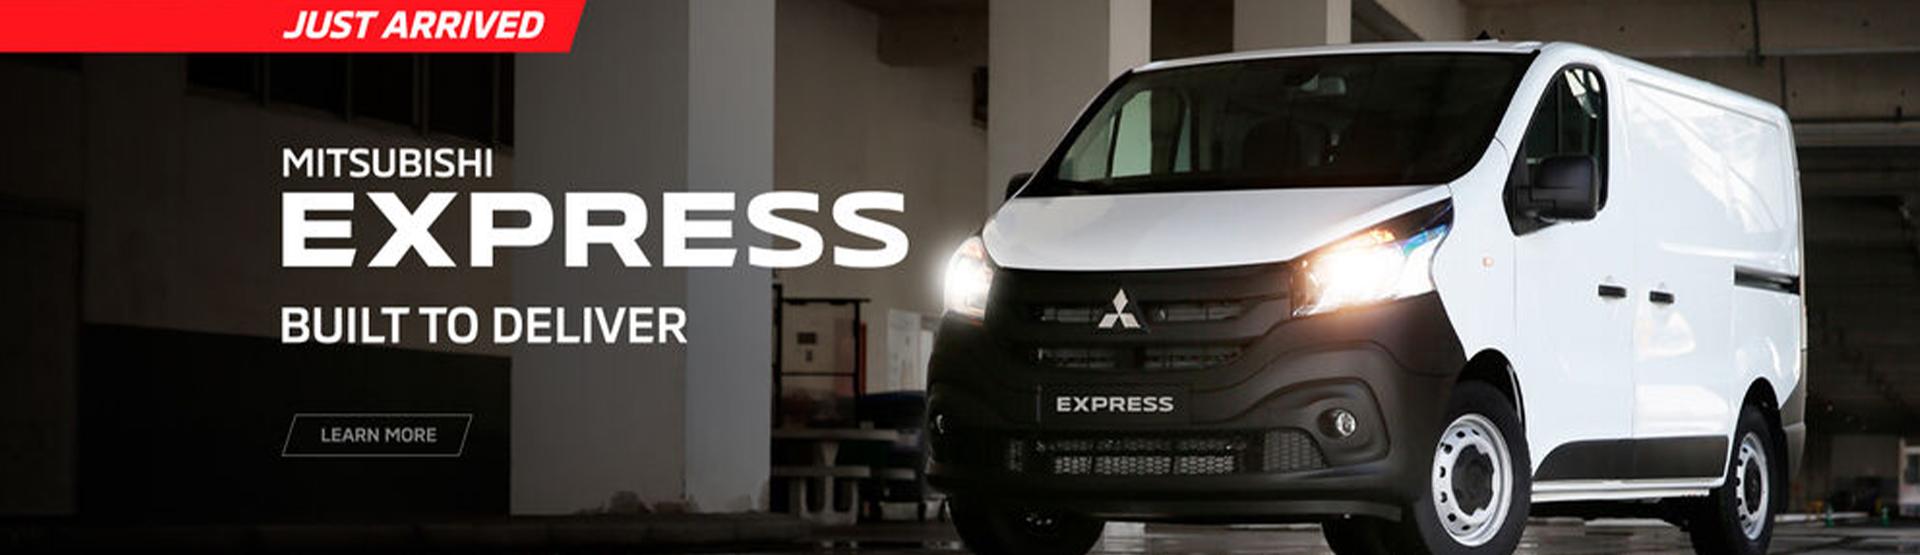 Mitsubishi Express: Built to Deliver